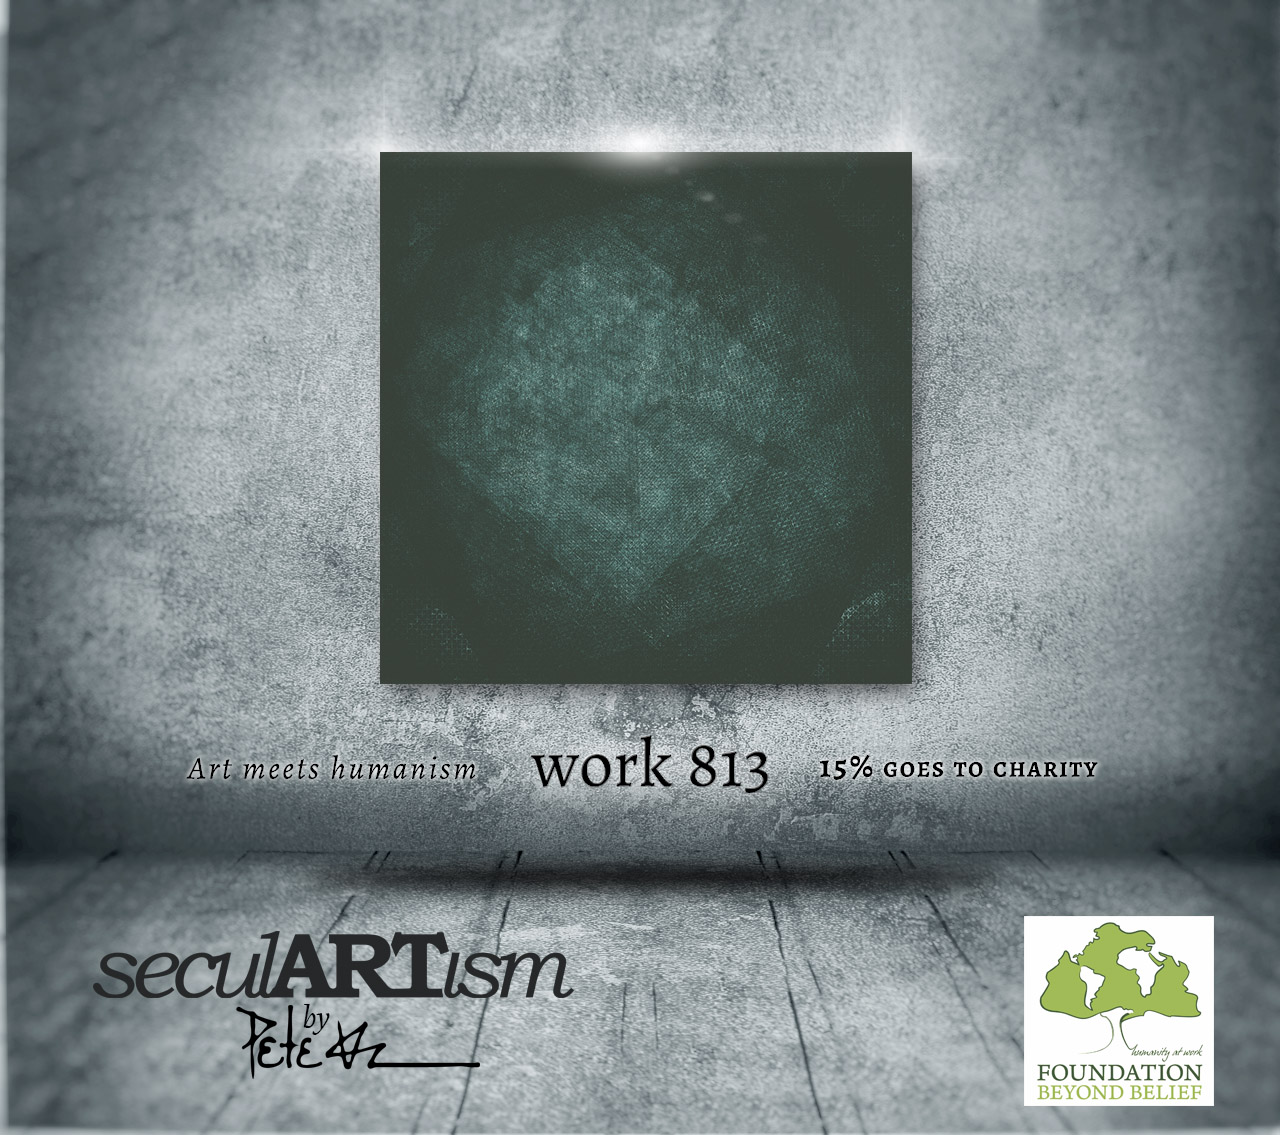 wall work 813 seculartism web